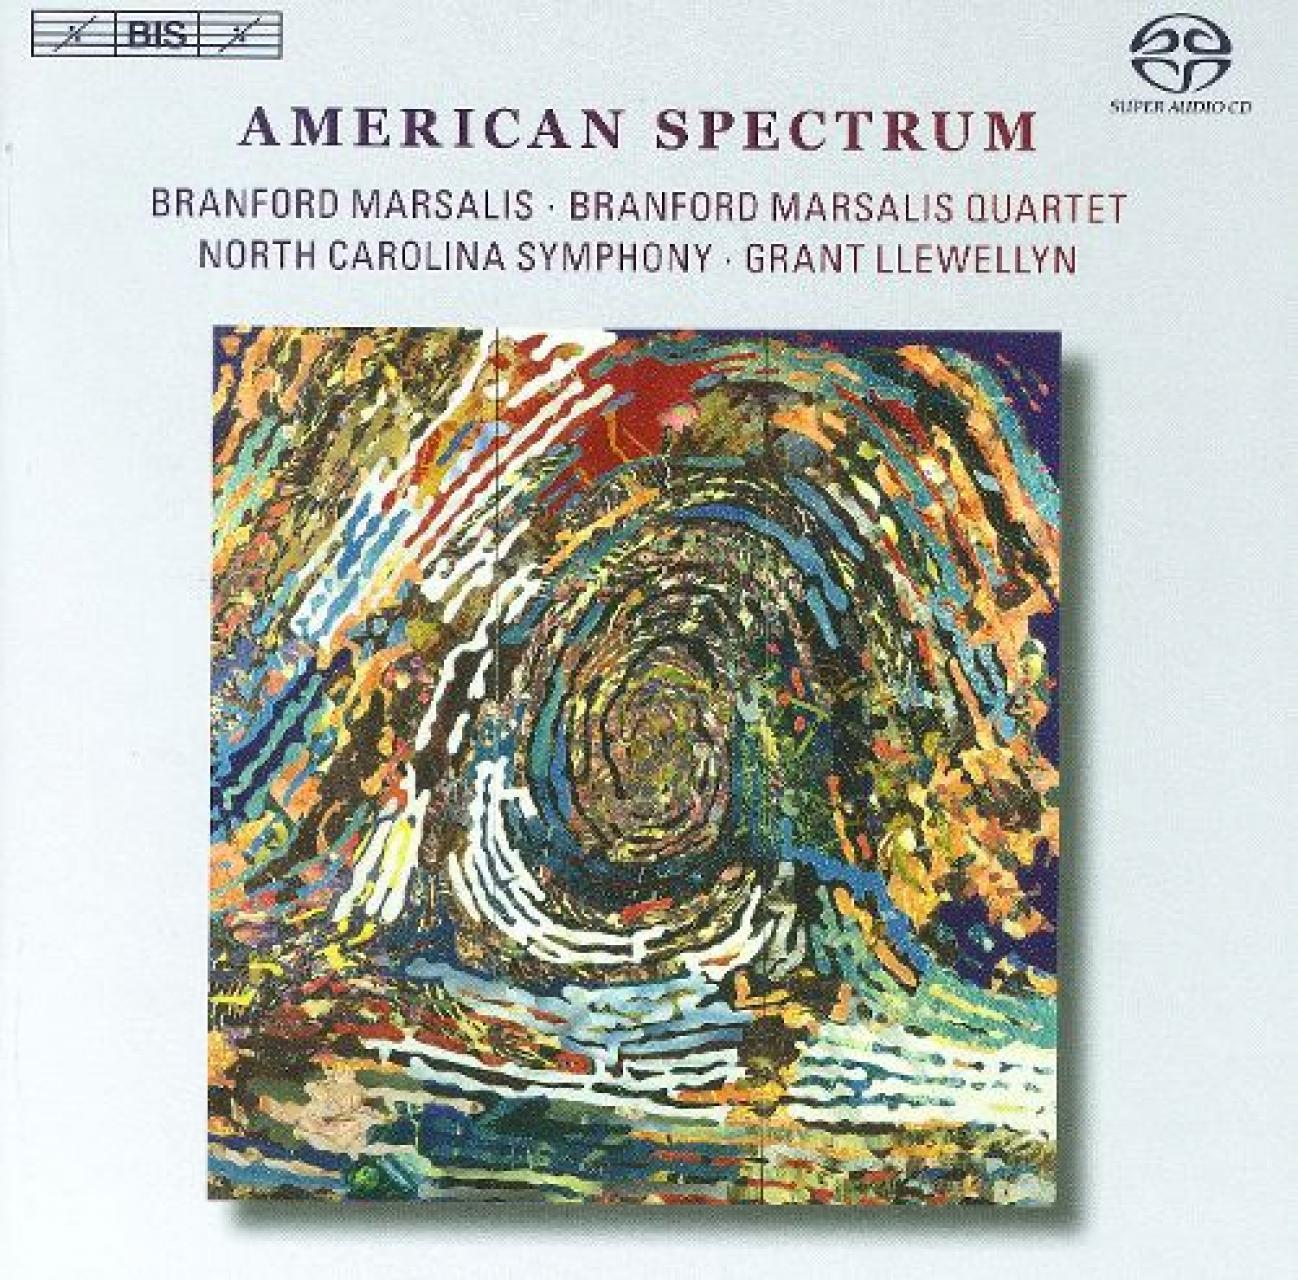 Branford Marsalis - American Spectrum